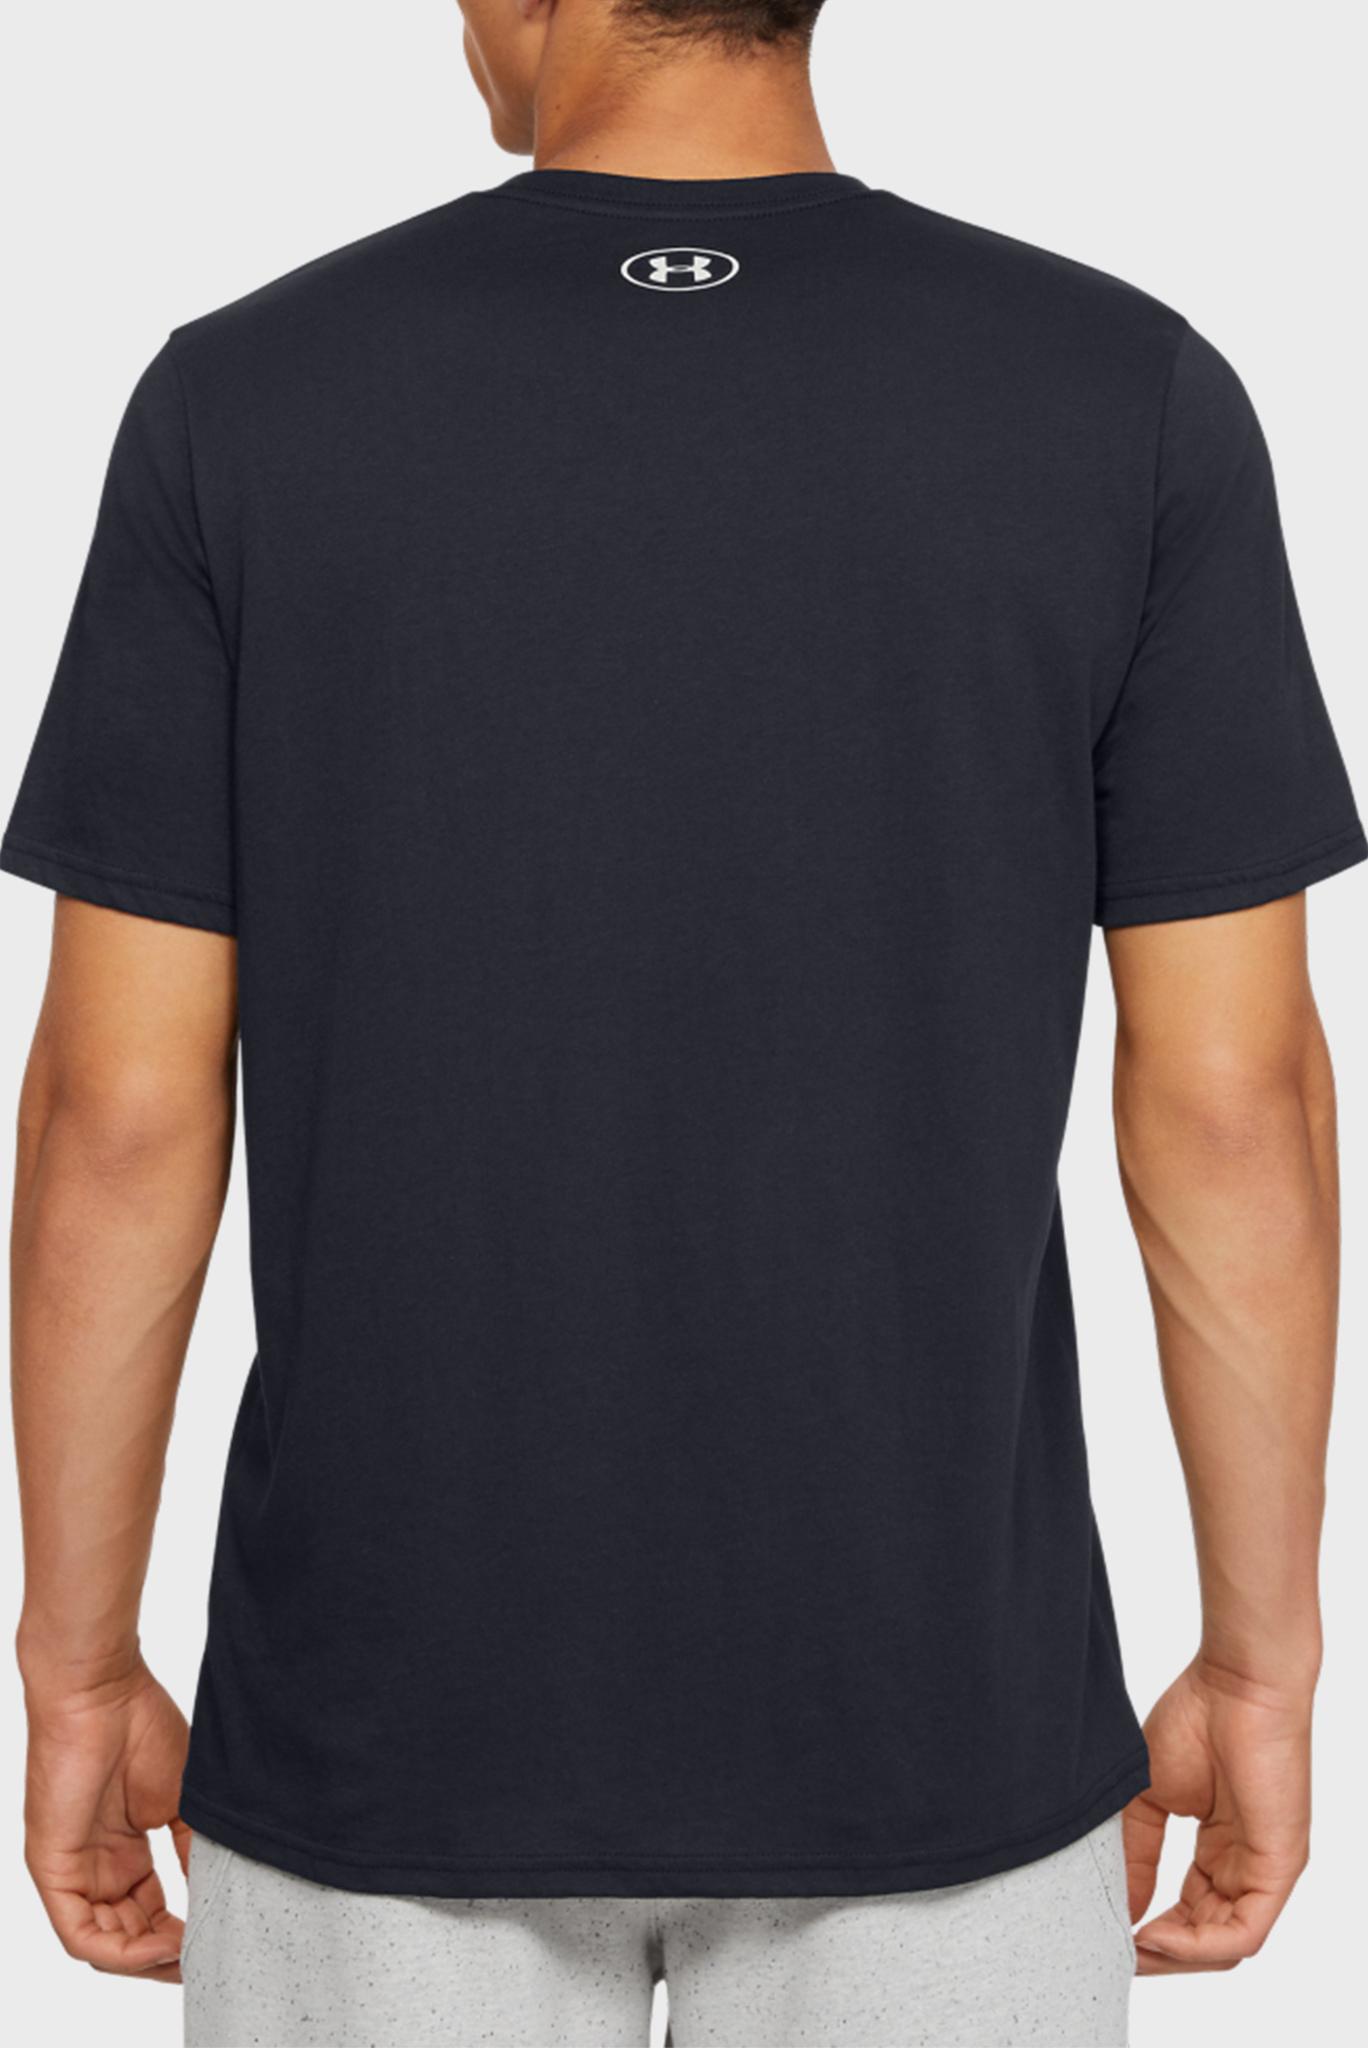 Мужская черная футболка UA PERF. ORIGIN MISSION SS-BLK Under Armour